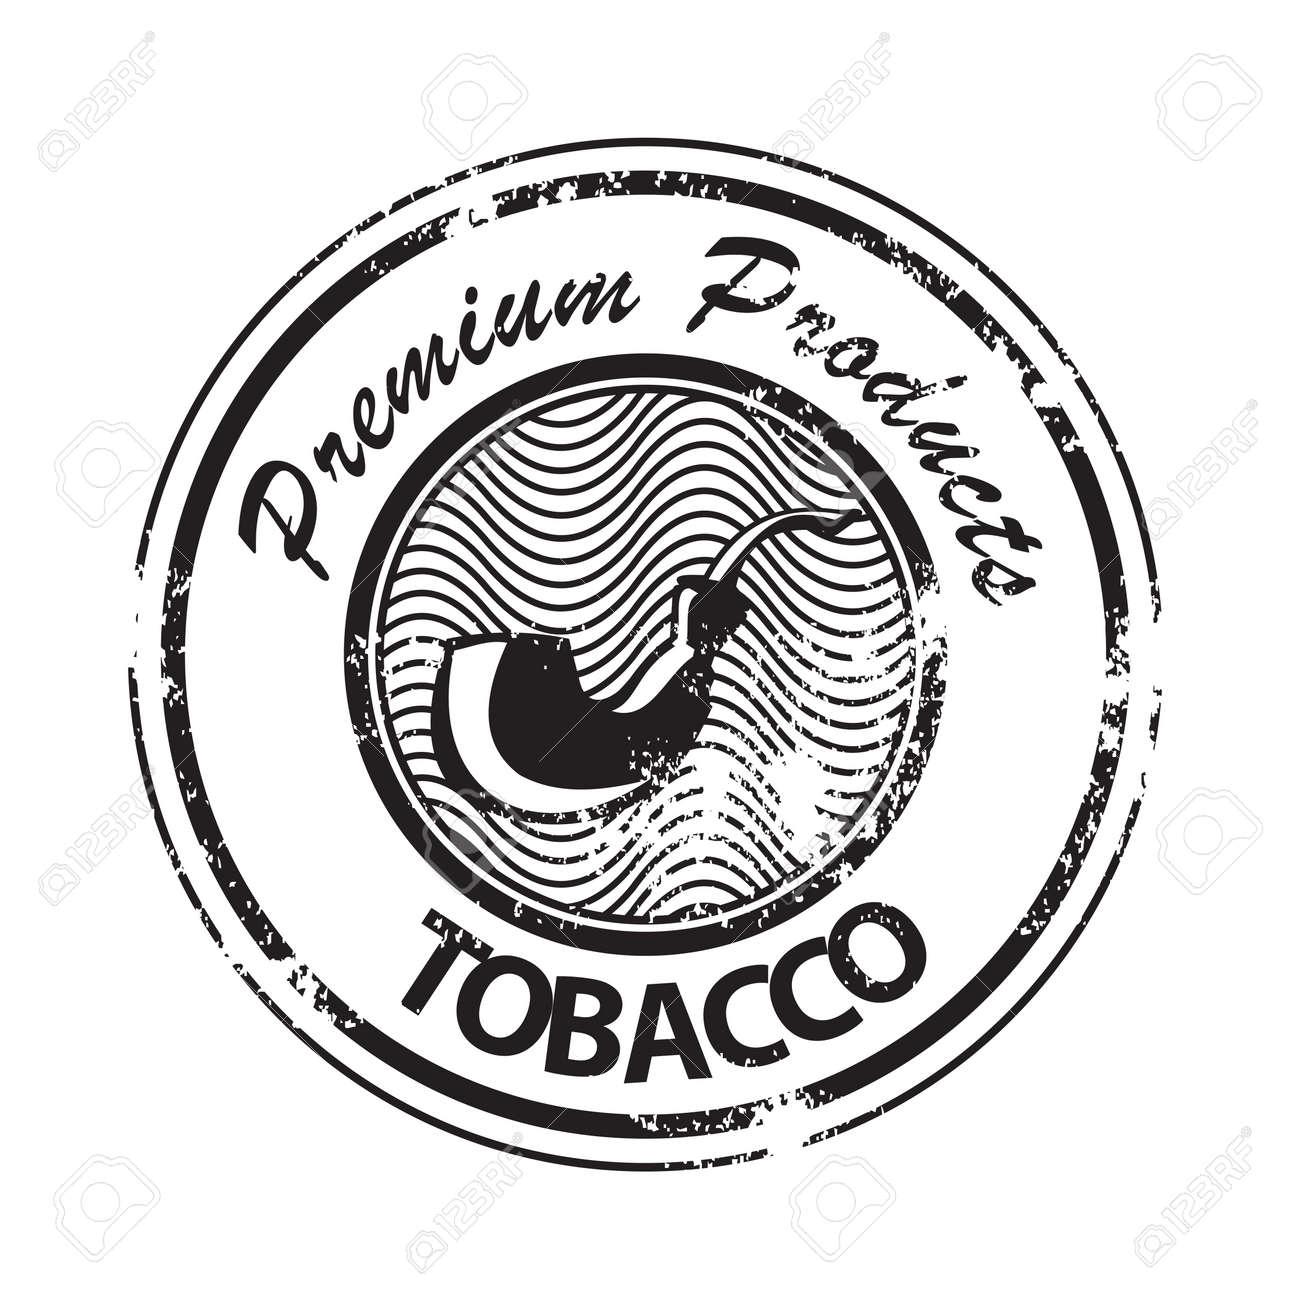 Tobacco Stock Vector - 18481422